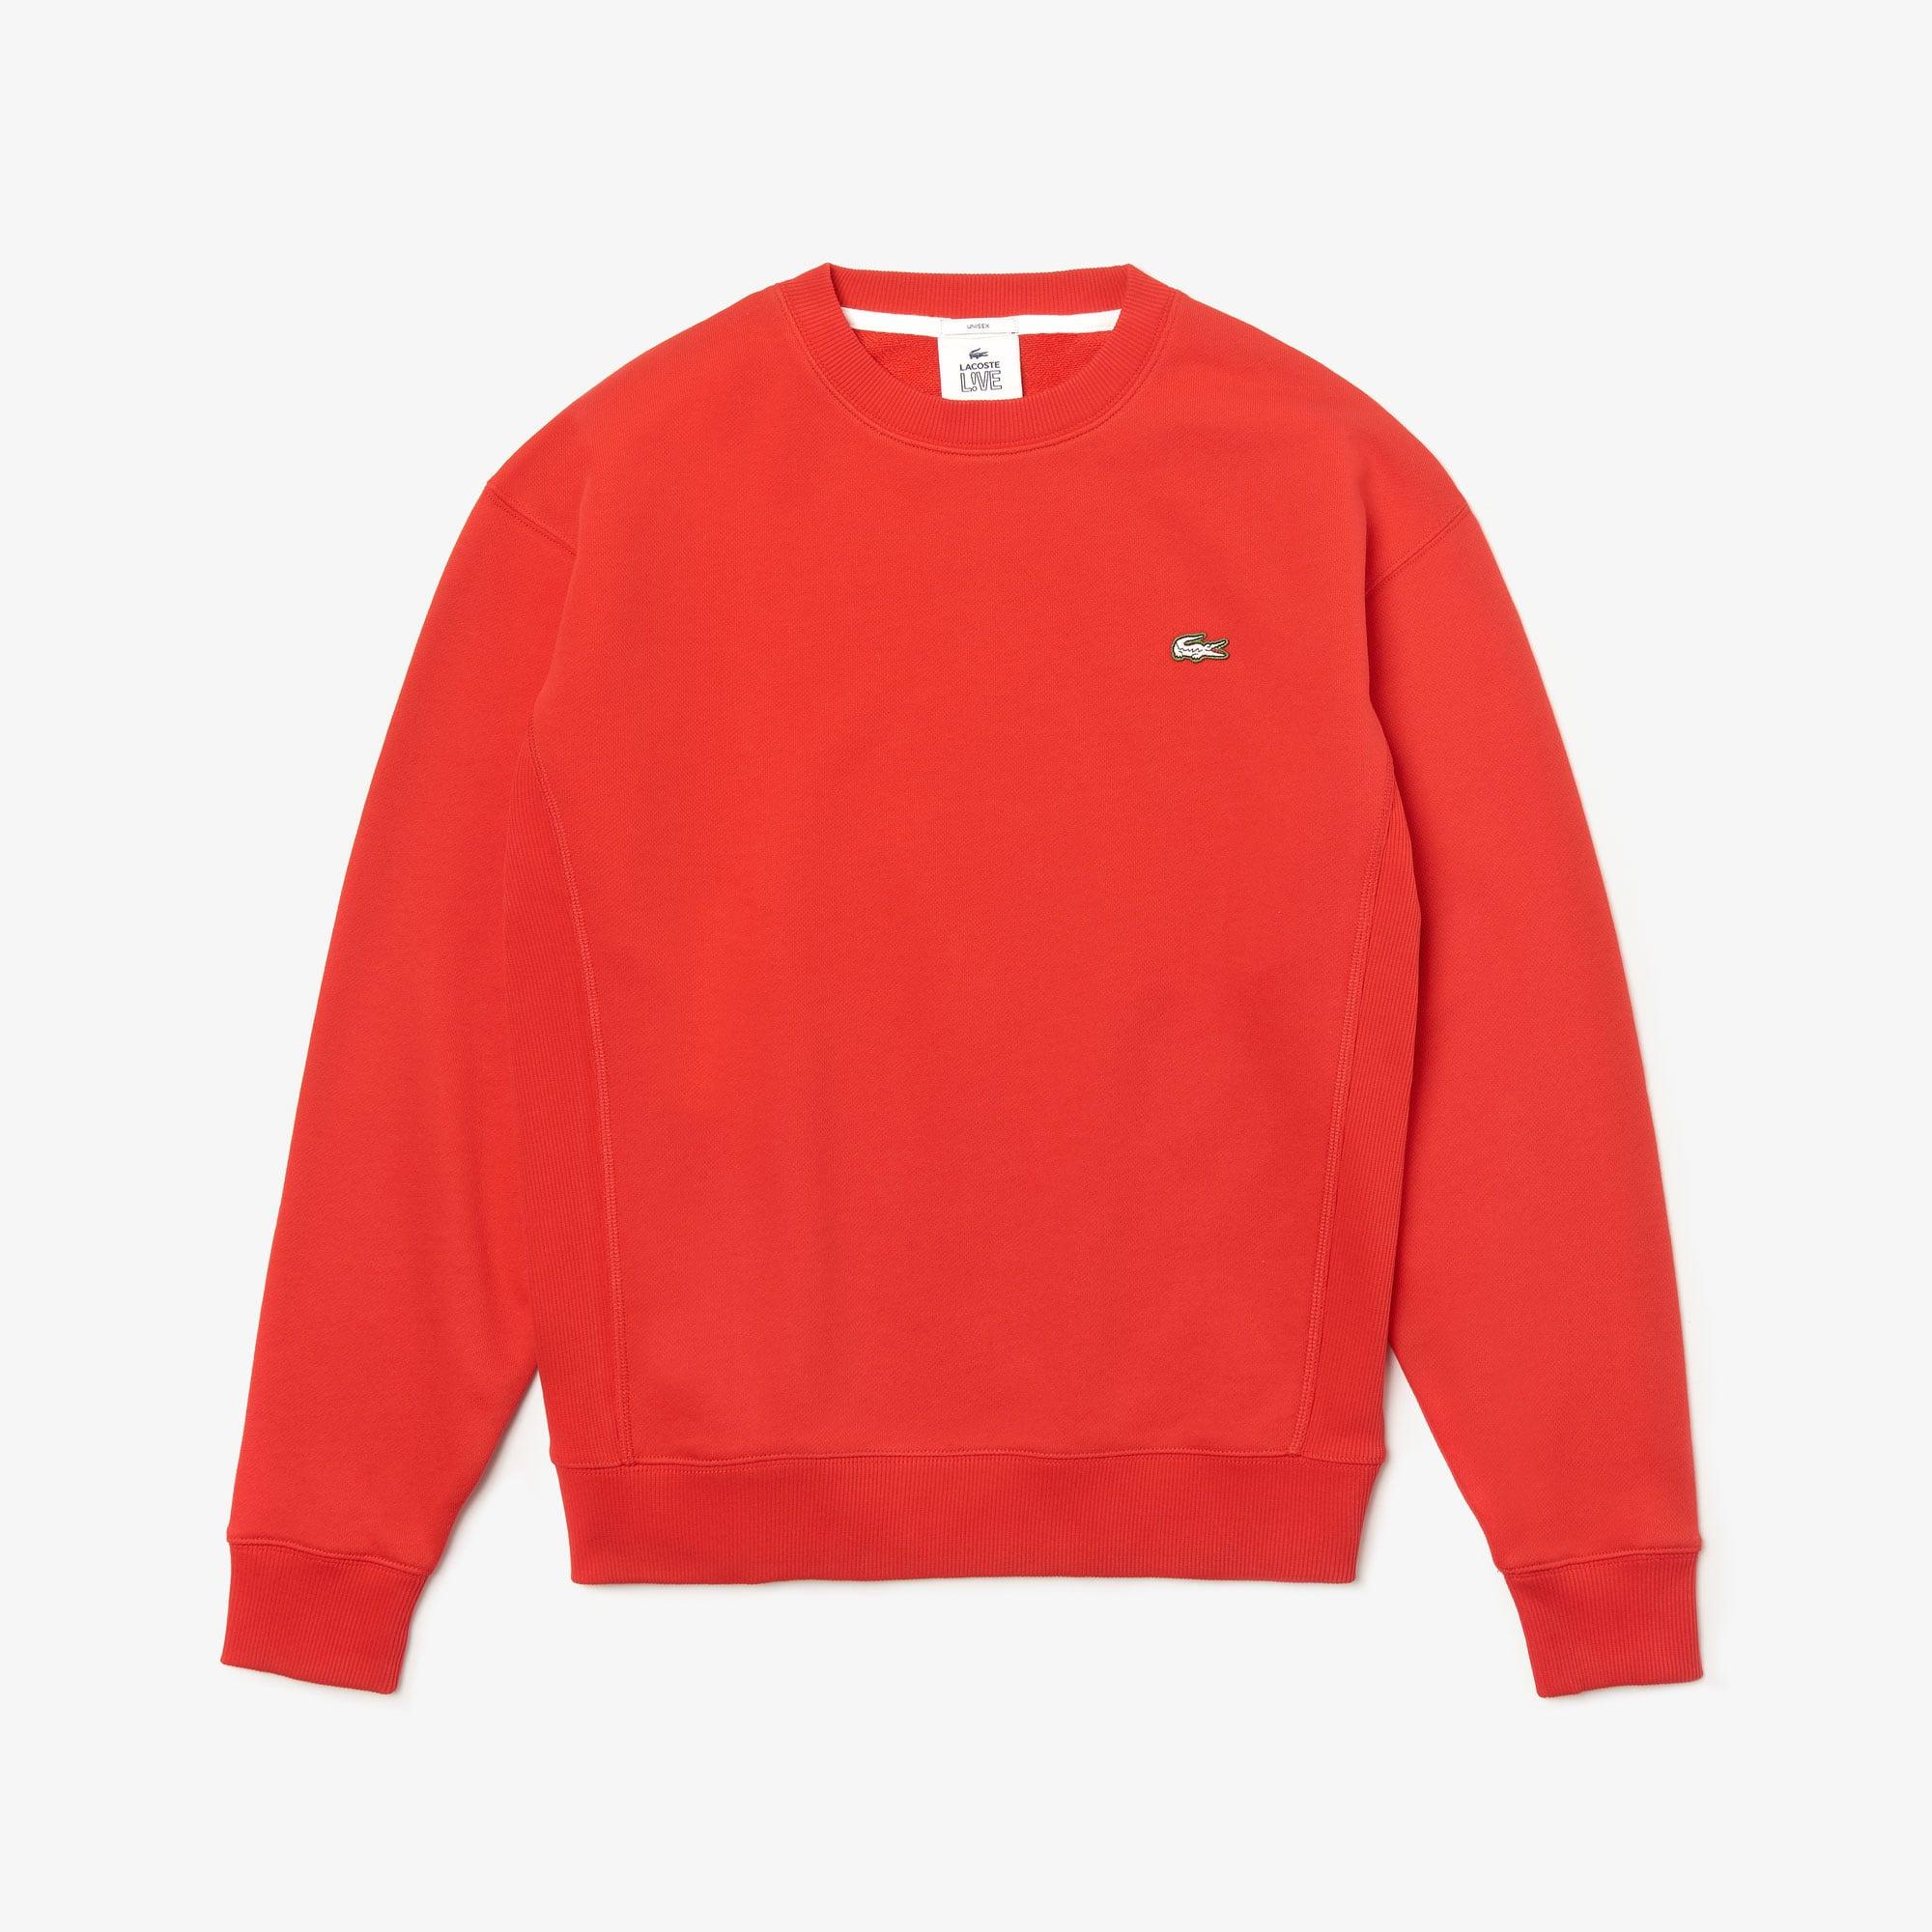 ecf7318b8c4a Pulls Femme, Sweats | Vêtements Femme | LACOSTE